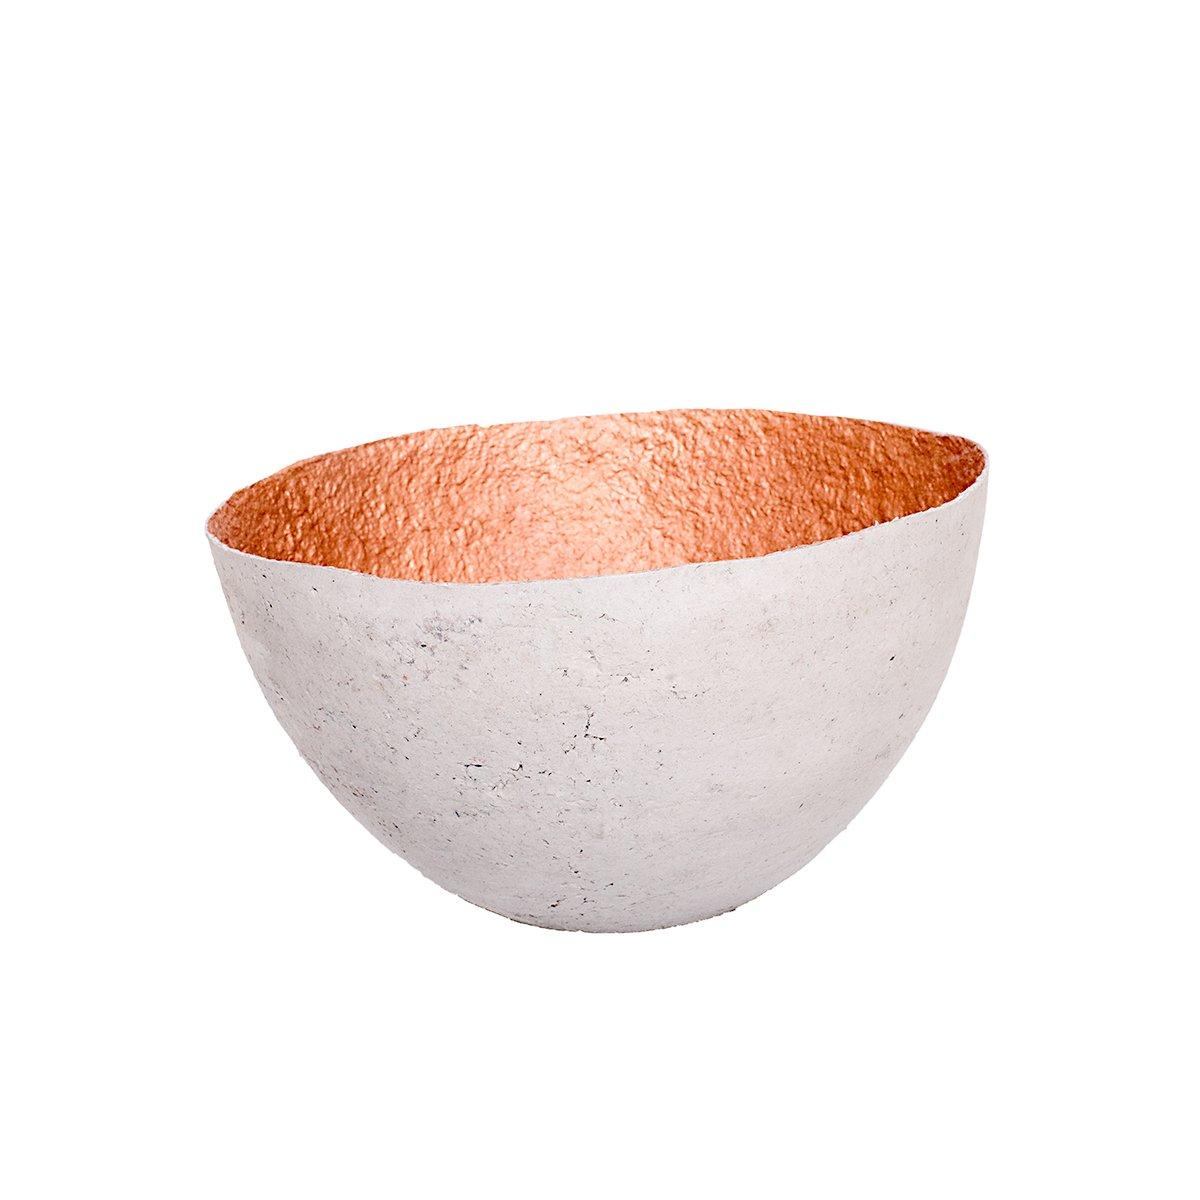 Large_pulp_bowl3_2048x.jpg